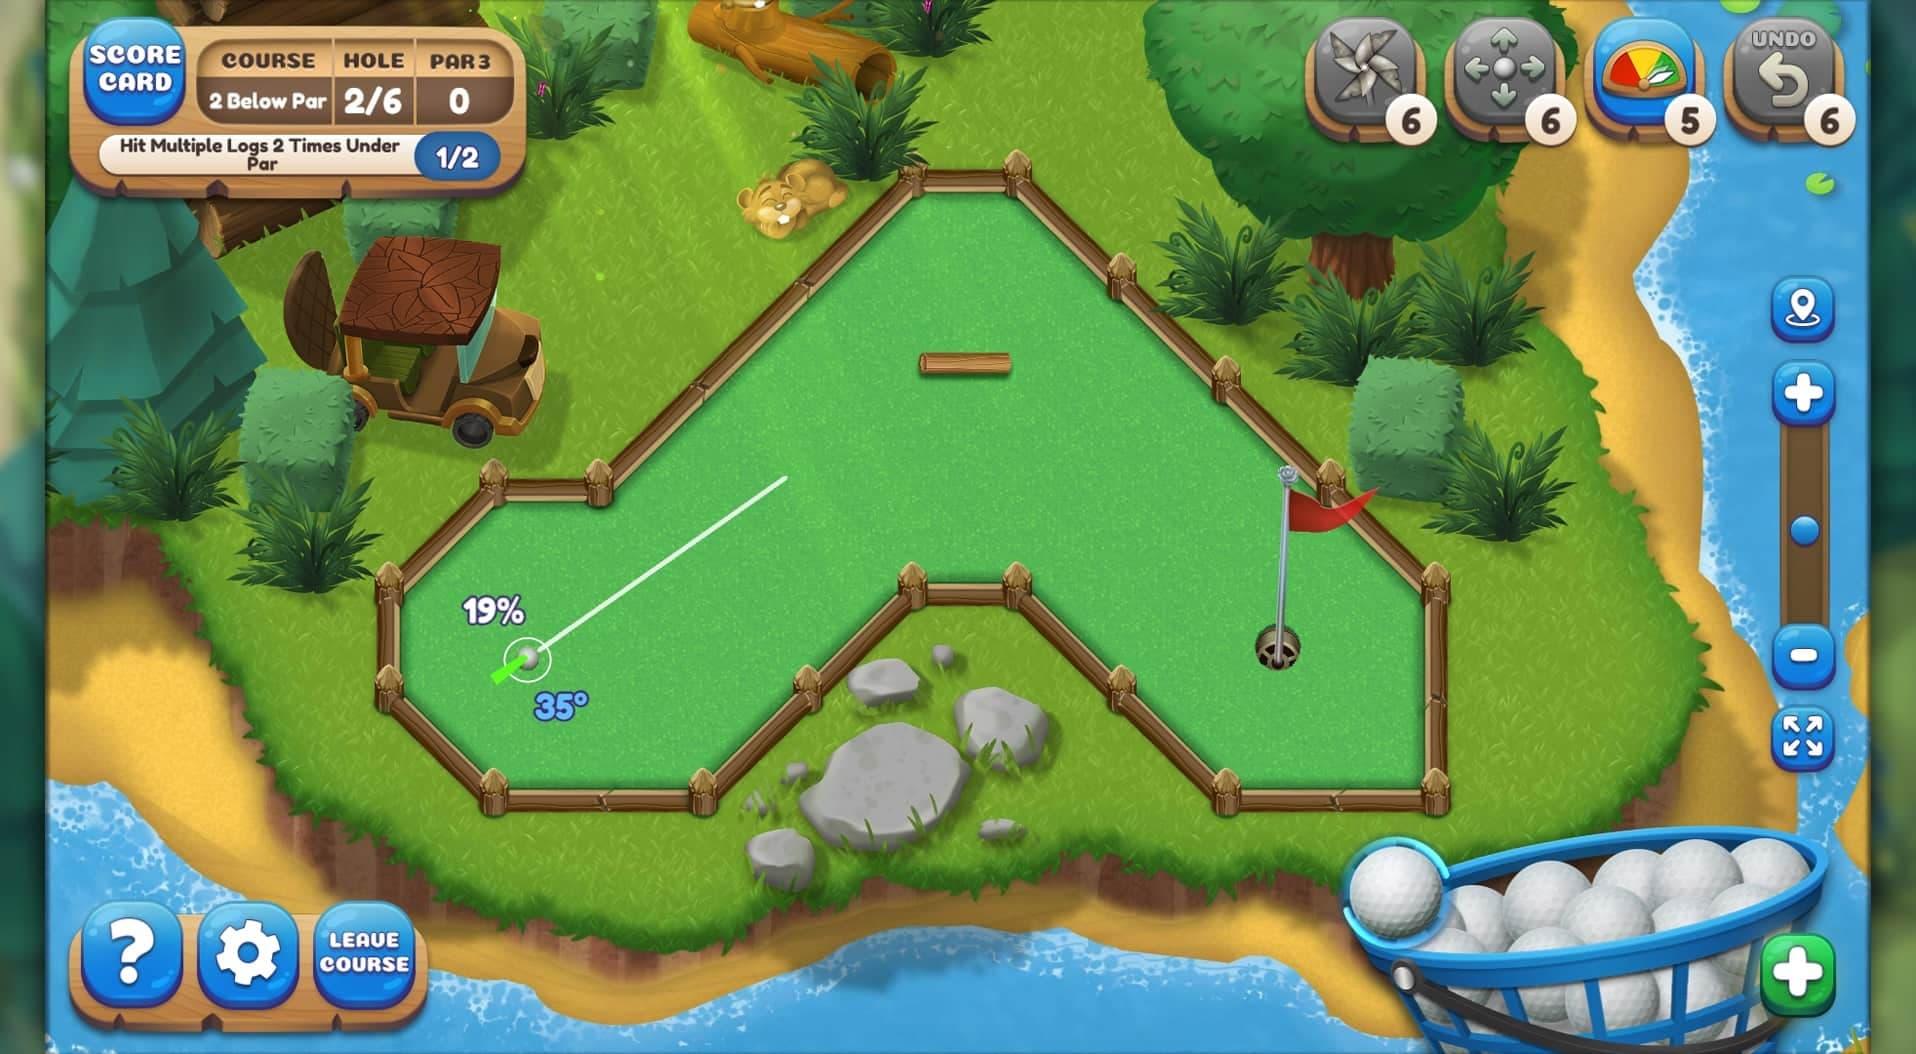 12++ Best free online mini golf games ideas in 2021